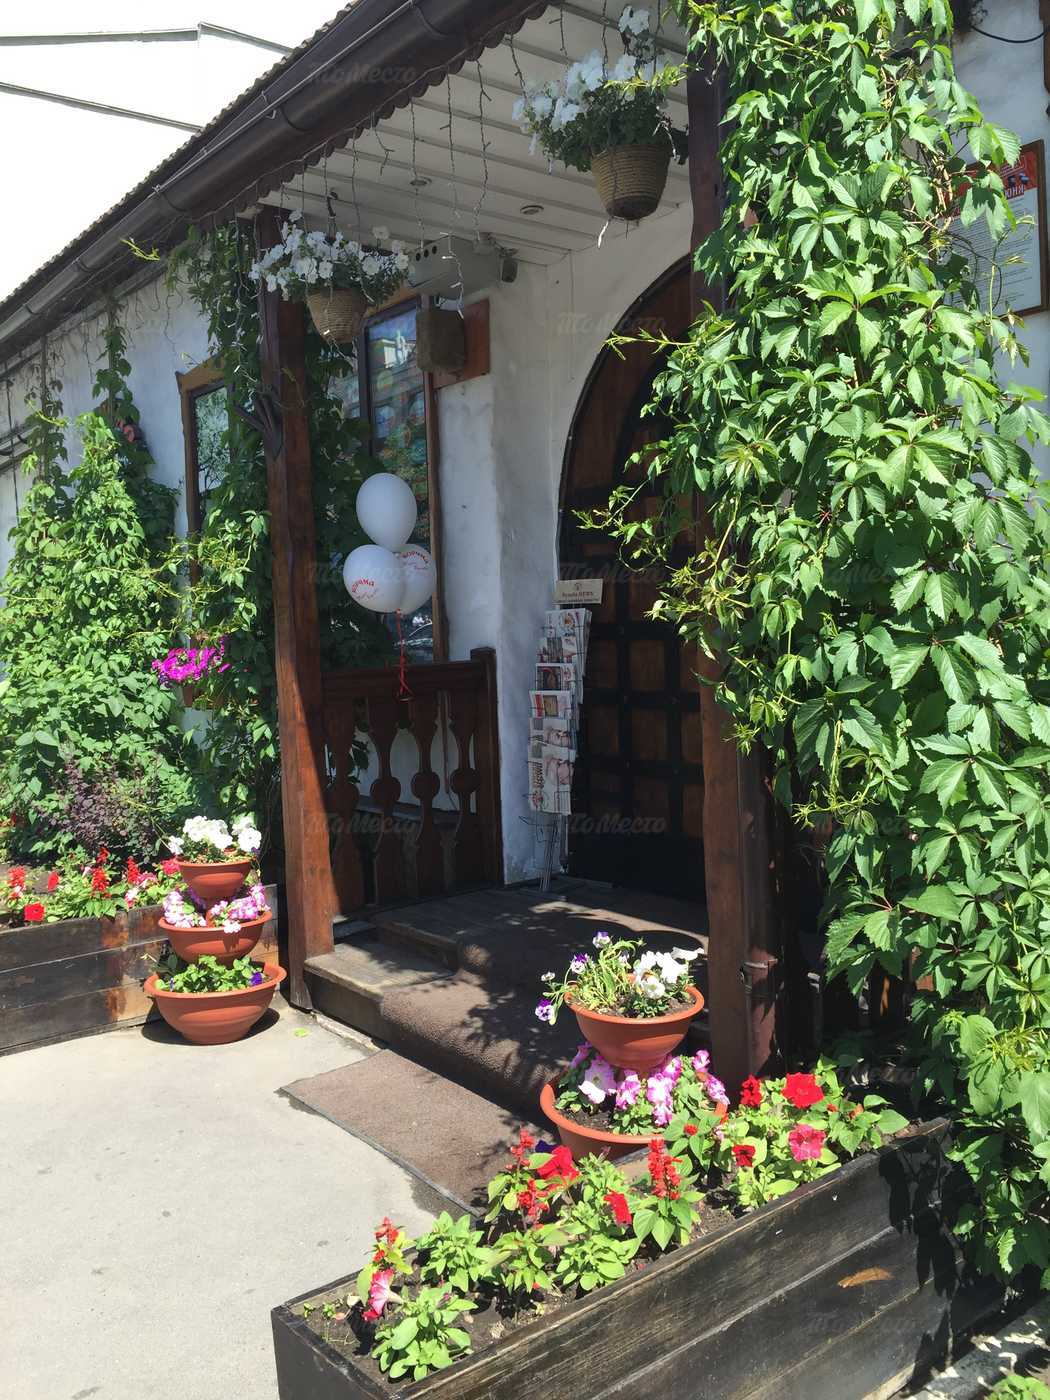 Меню ресторана Корчма Тарас Бульба на Моховой улице